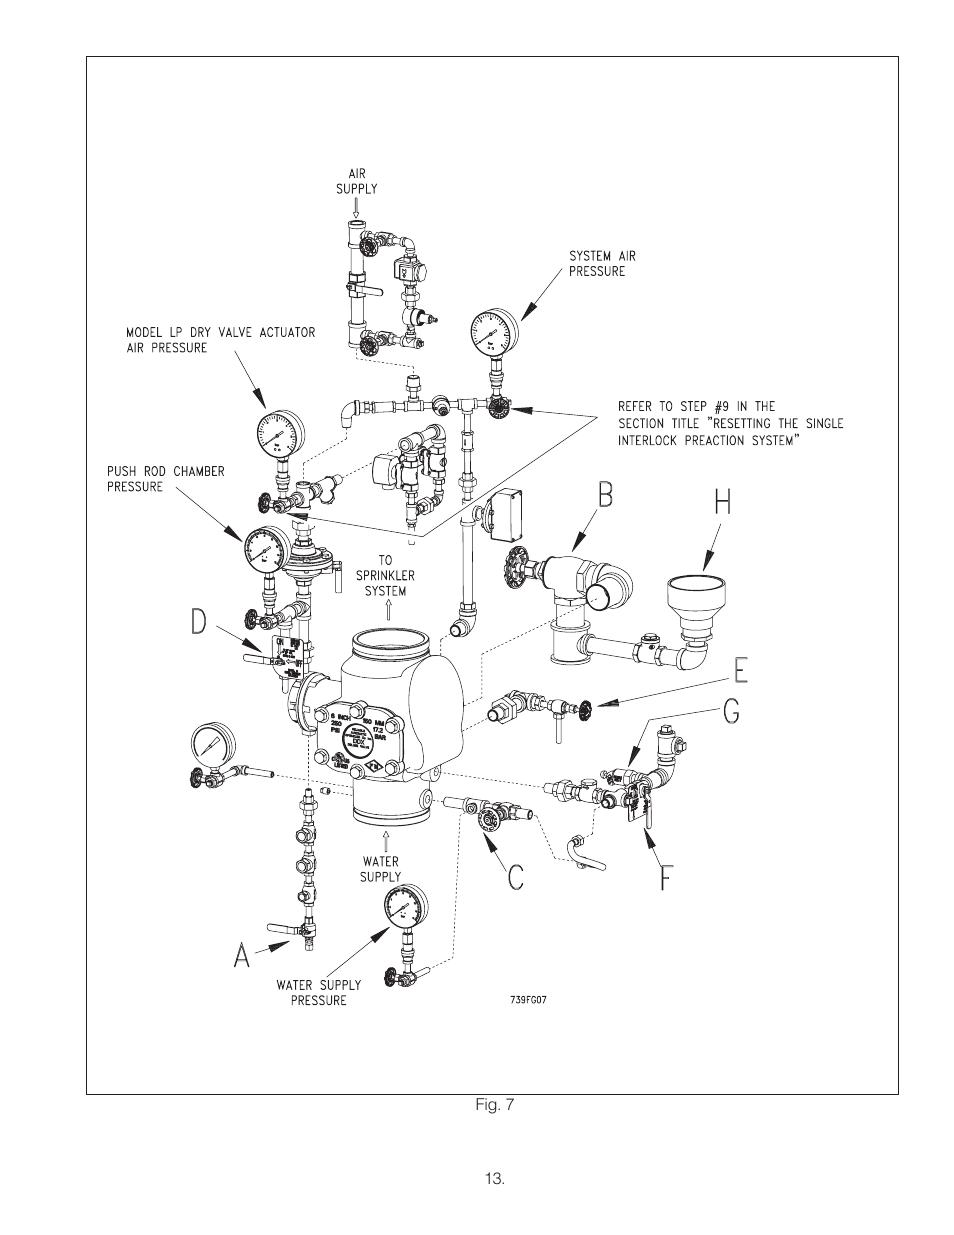 Reliable Sprinkler RELIABLE Single Interlock Preaction